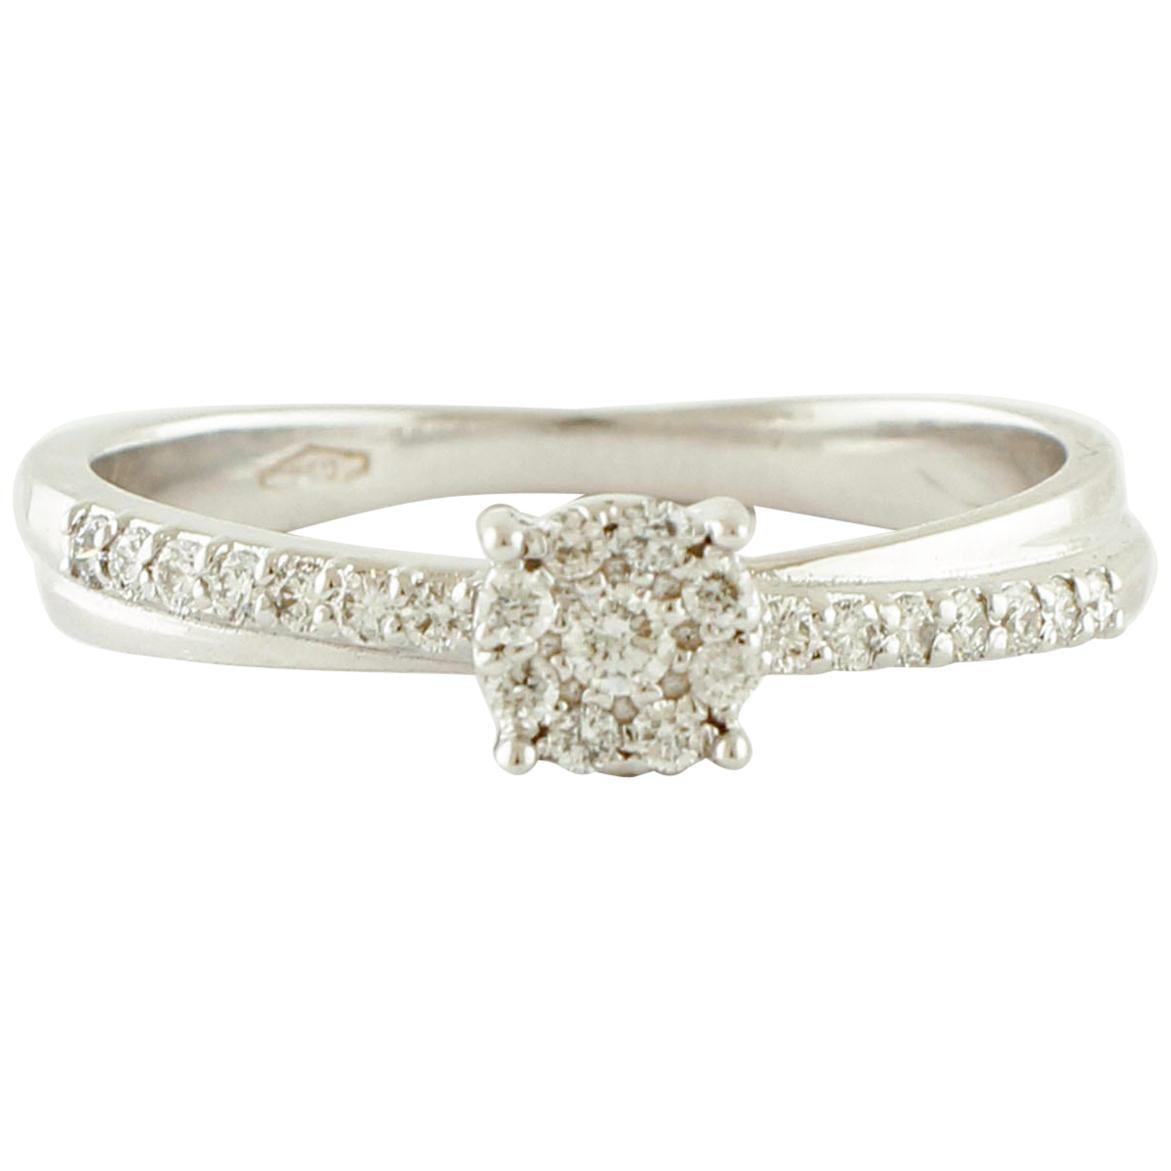 White Diamonds, 18 Karat White Gold Engagement/Solitaire Ring